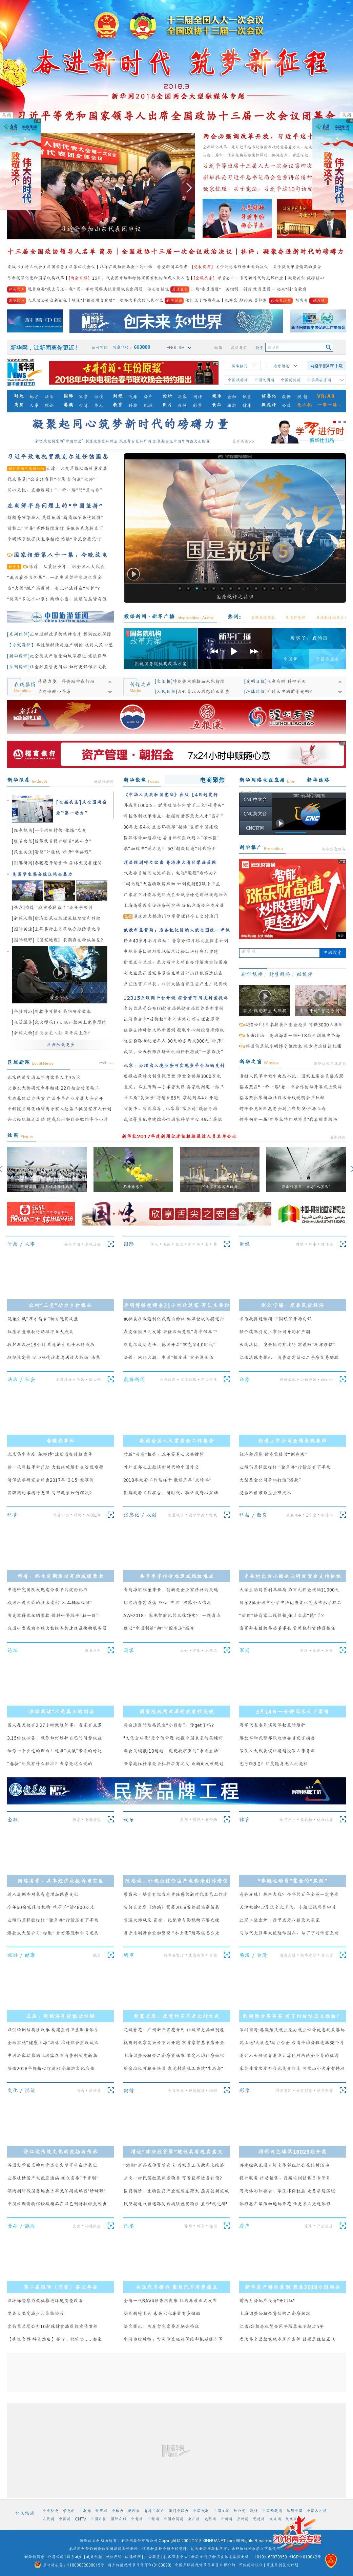 Xinhua at Thursday March 15, 2018, 2:23 p.m. UTC